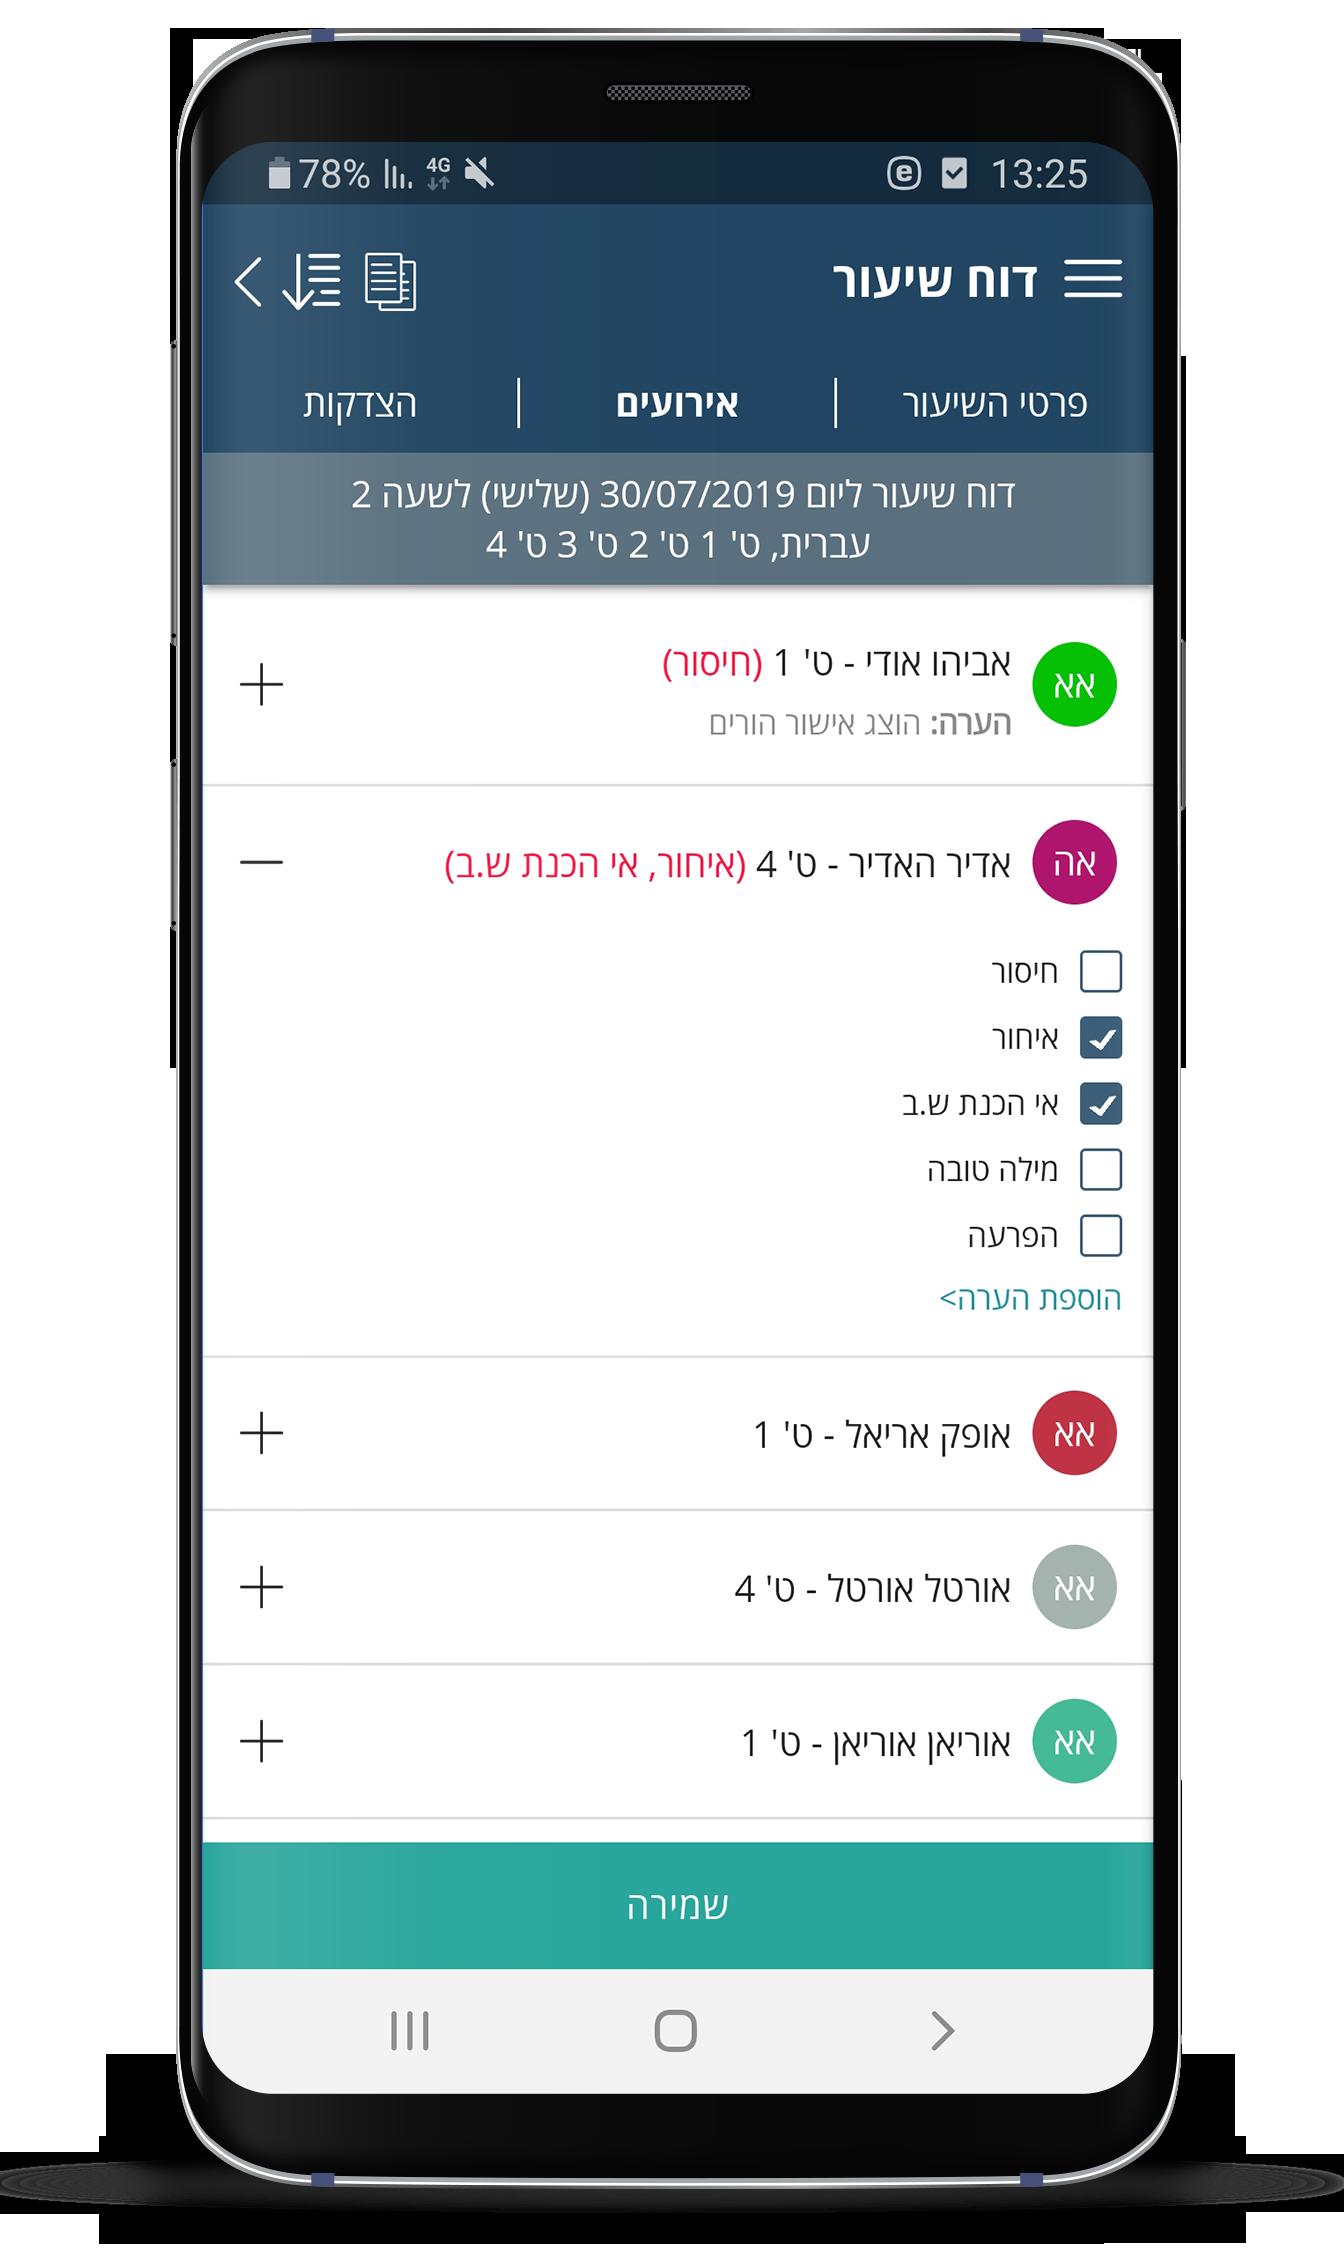 Webtop_Mobile_LessonReport